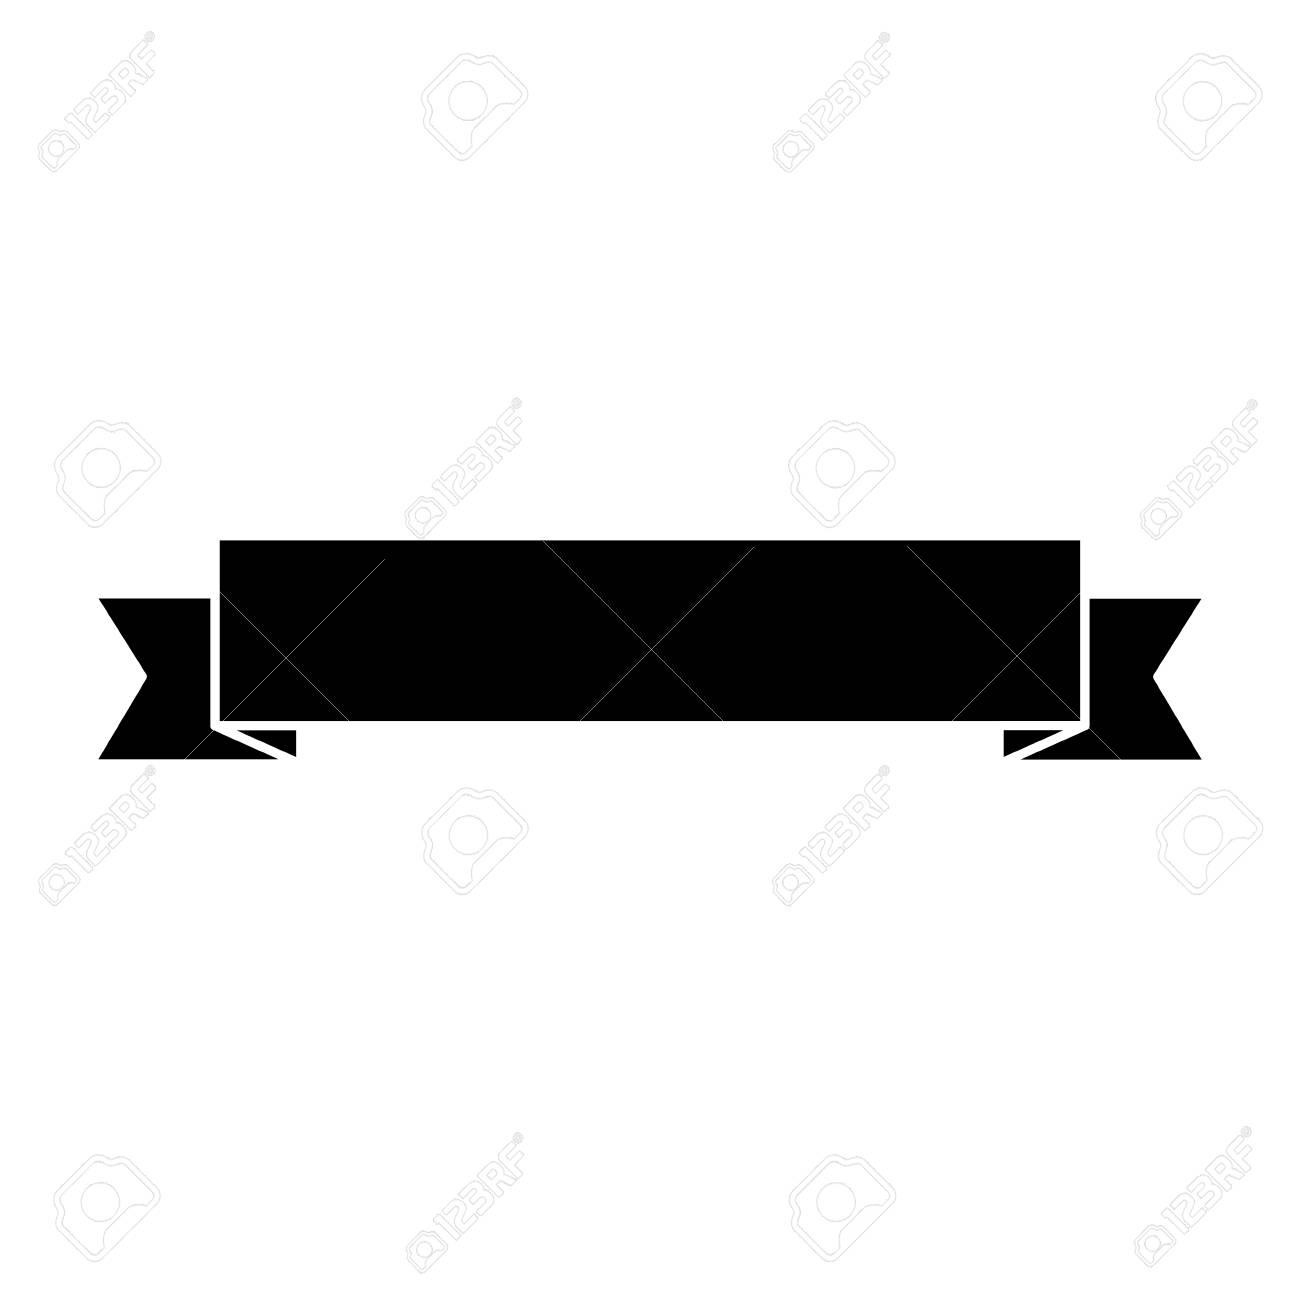 Ribbon banner icon image. Vector illustration design black and white. - 93448040